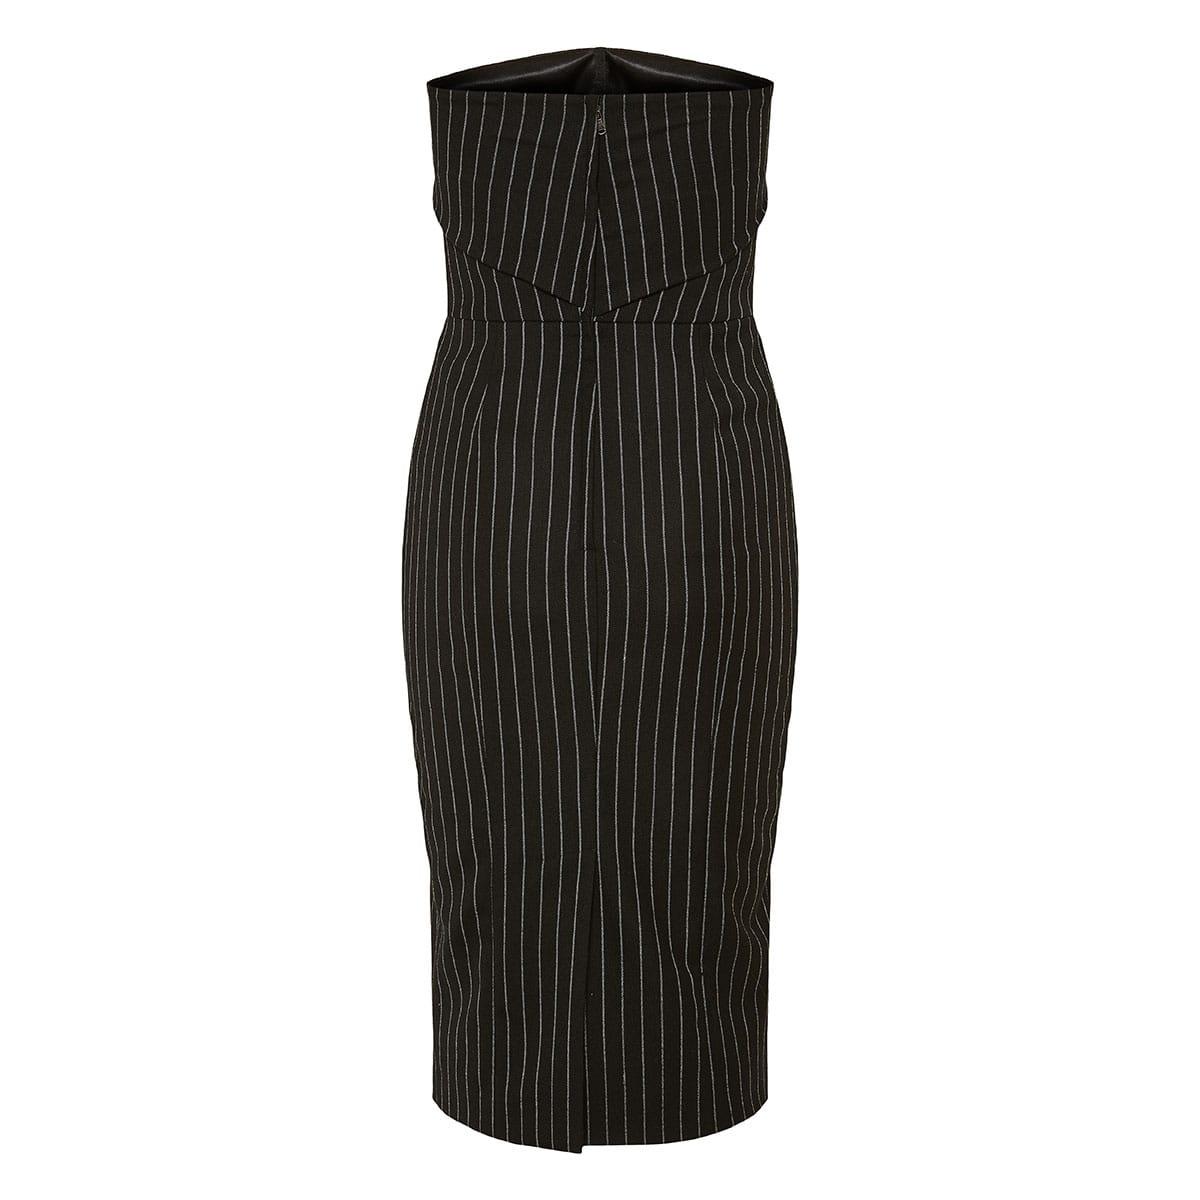 Pinstripe strapless midi dress